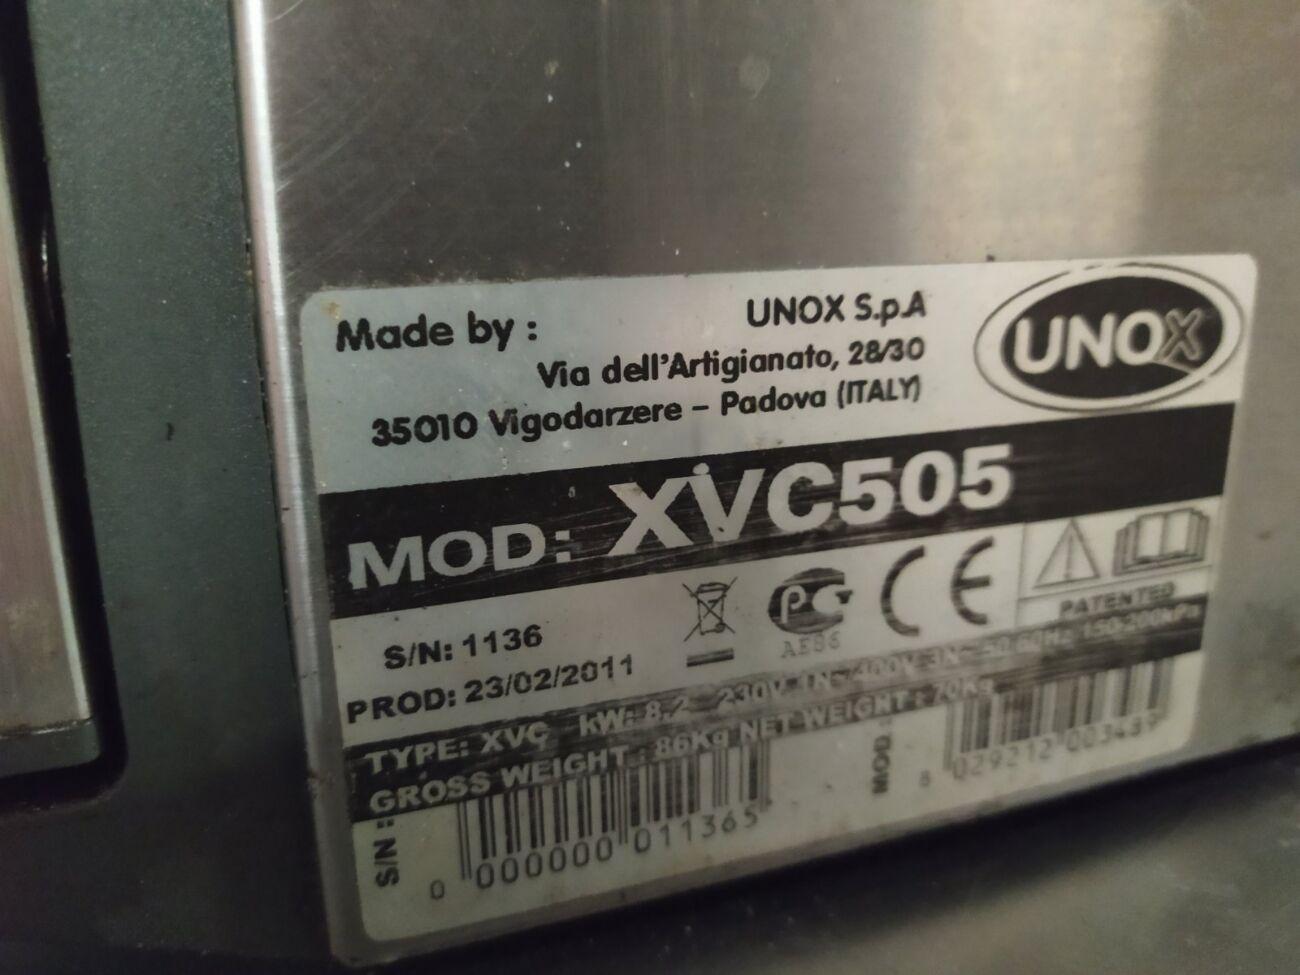 Пароконвектомат бу  Unox XVC 505 Печь  с паром  бу печка б/у